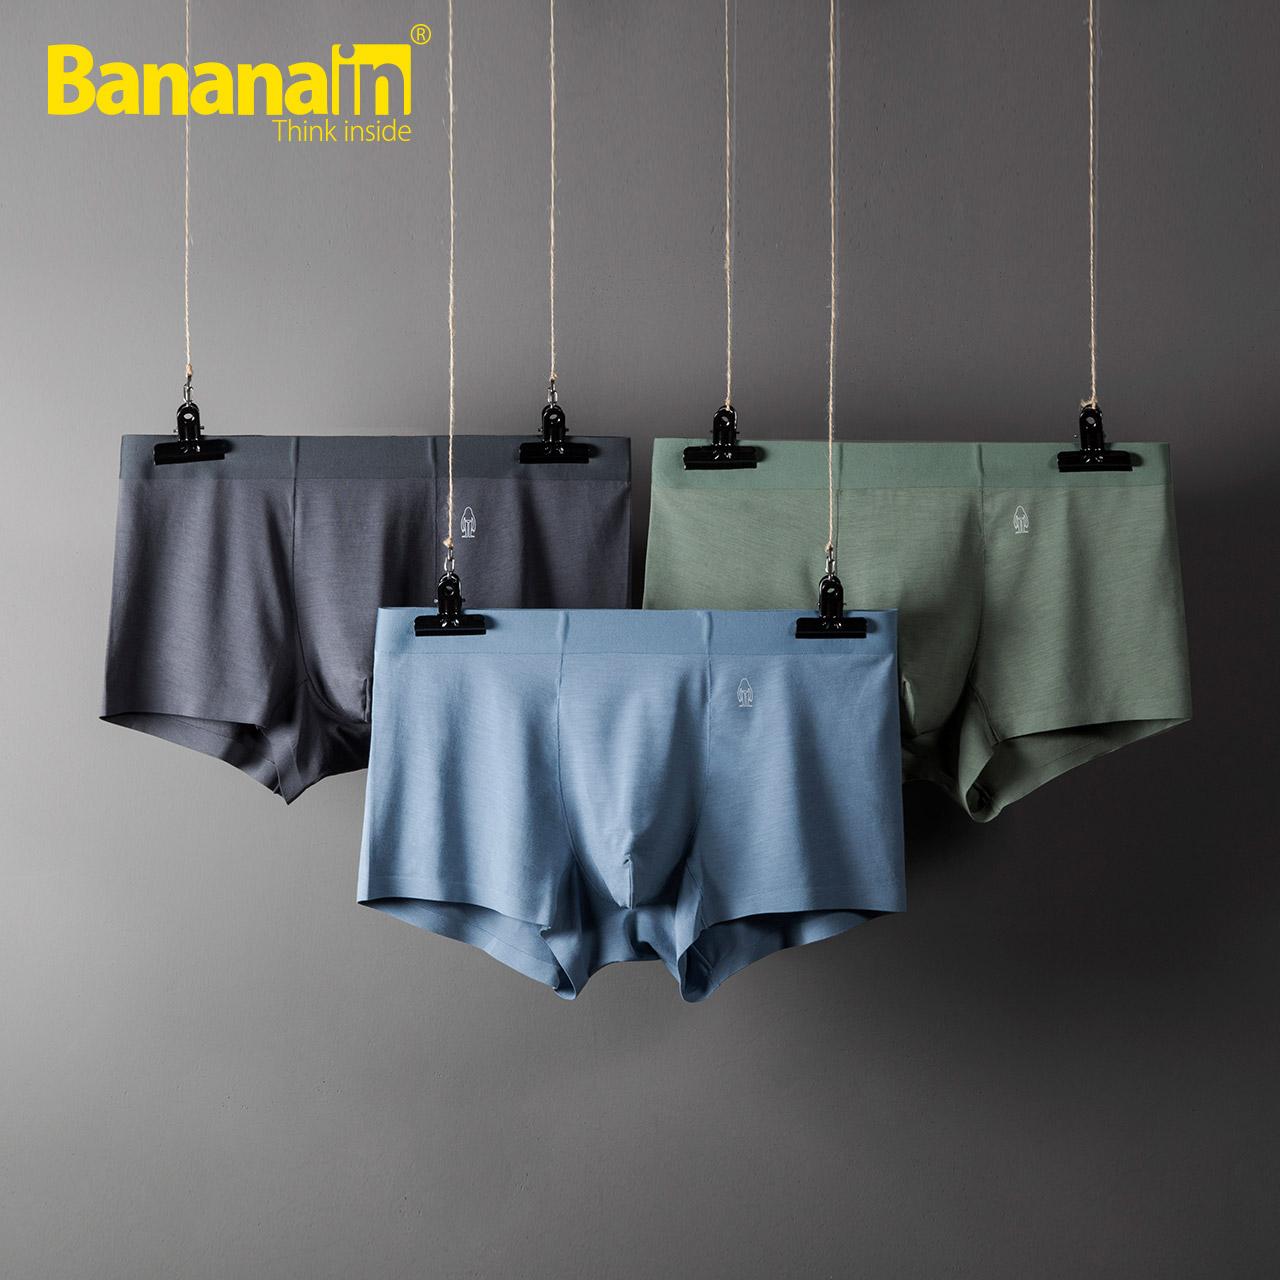 Bananain男士莫代尔冰丝感舒适无痕四角平角内裤薄500E3件装蕉纶